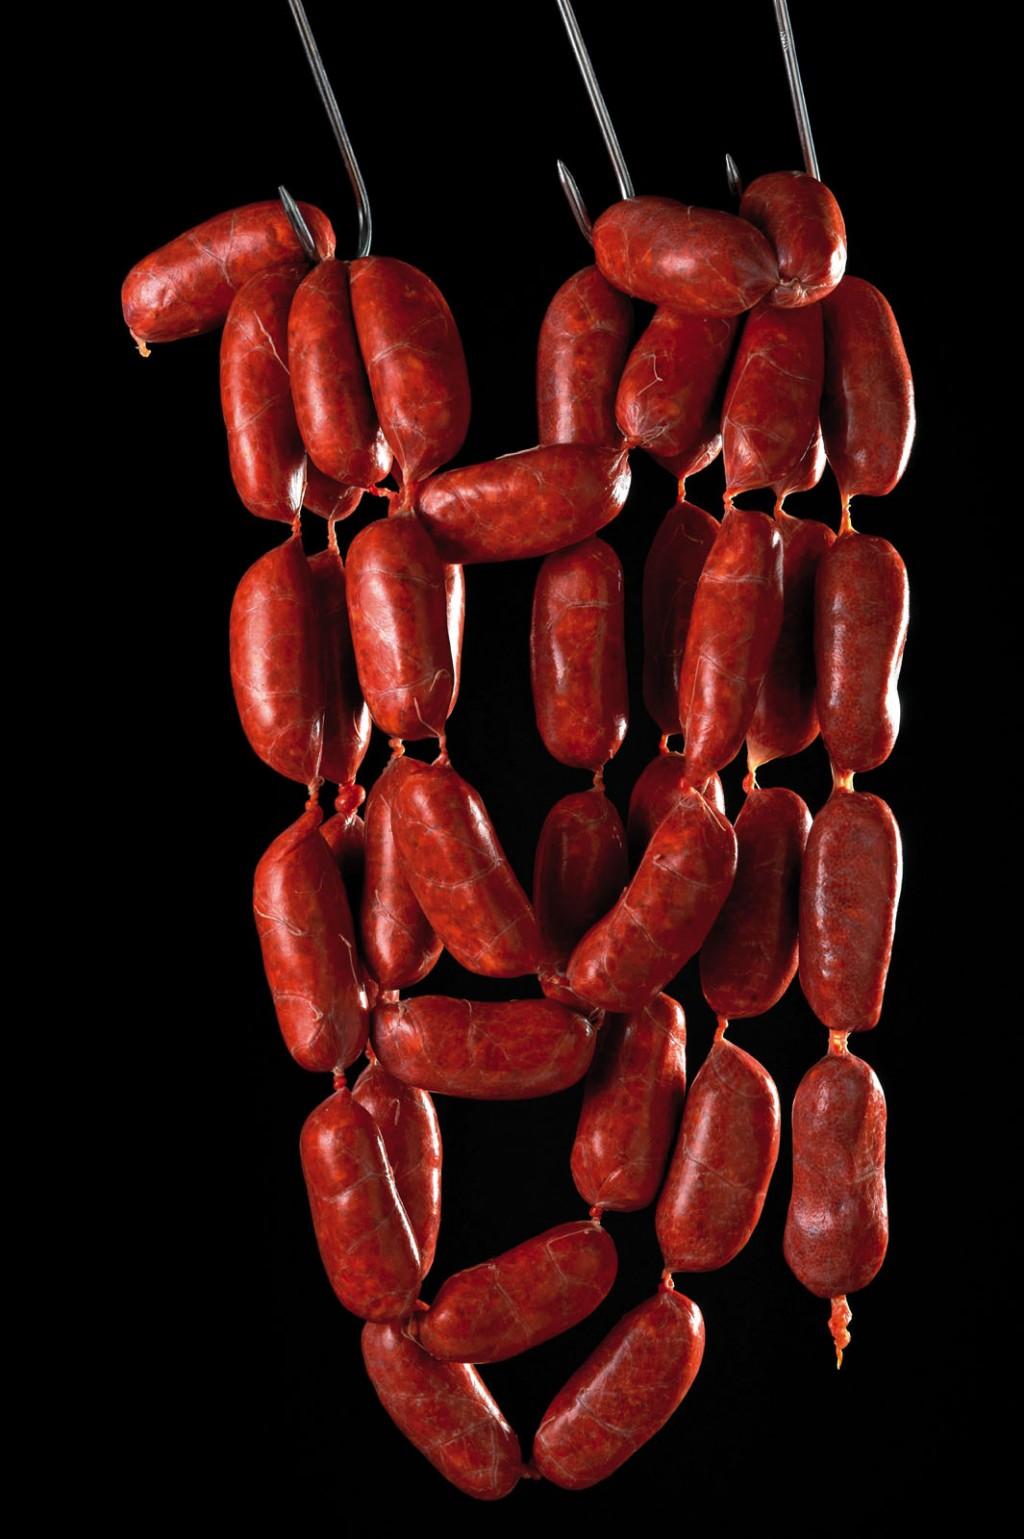 Chorizo à griller fort ou doux